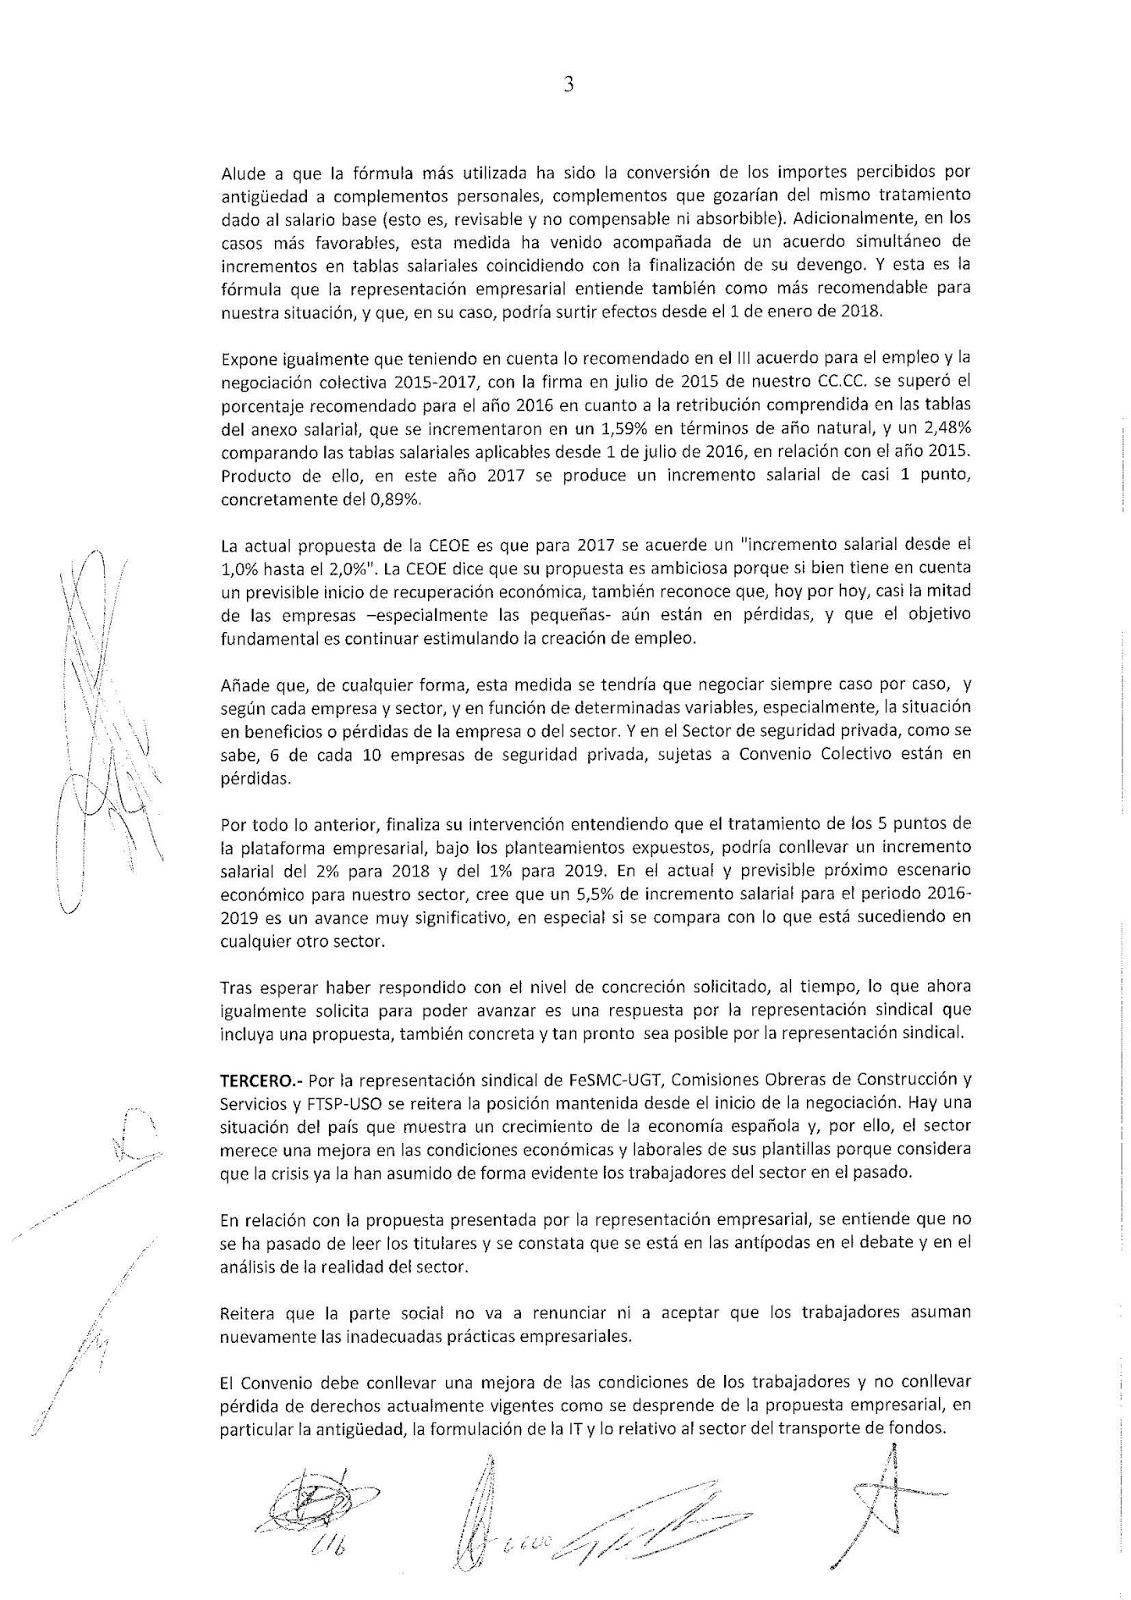 casesaseccionsindicalccoo: Circular ,Acta Nº 8 día 20 de junio ...